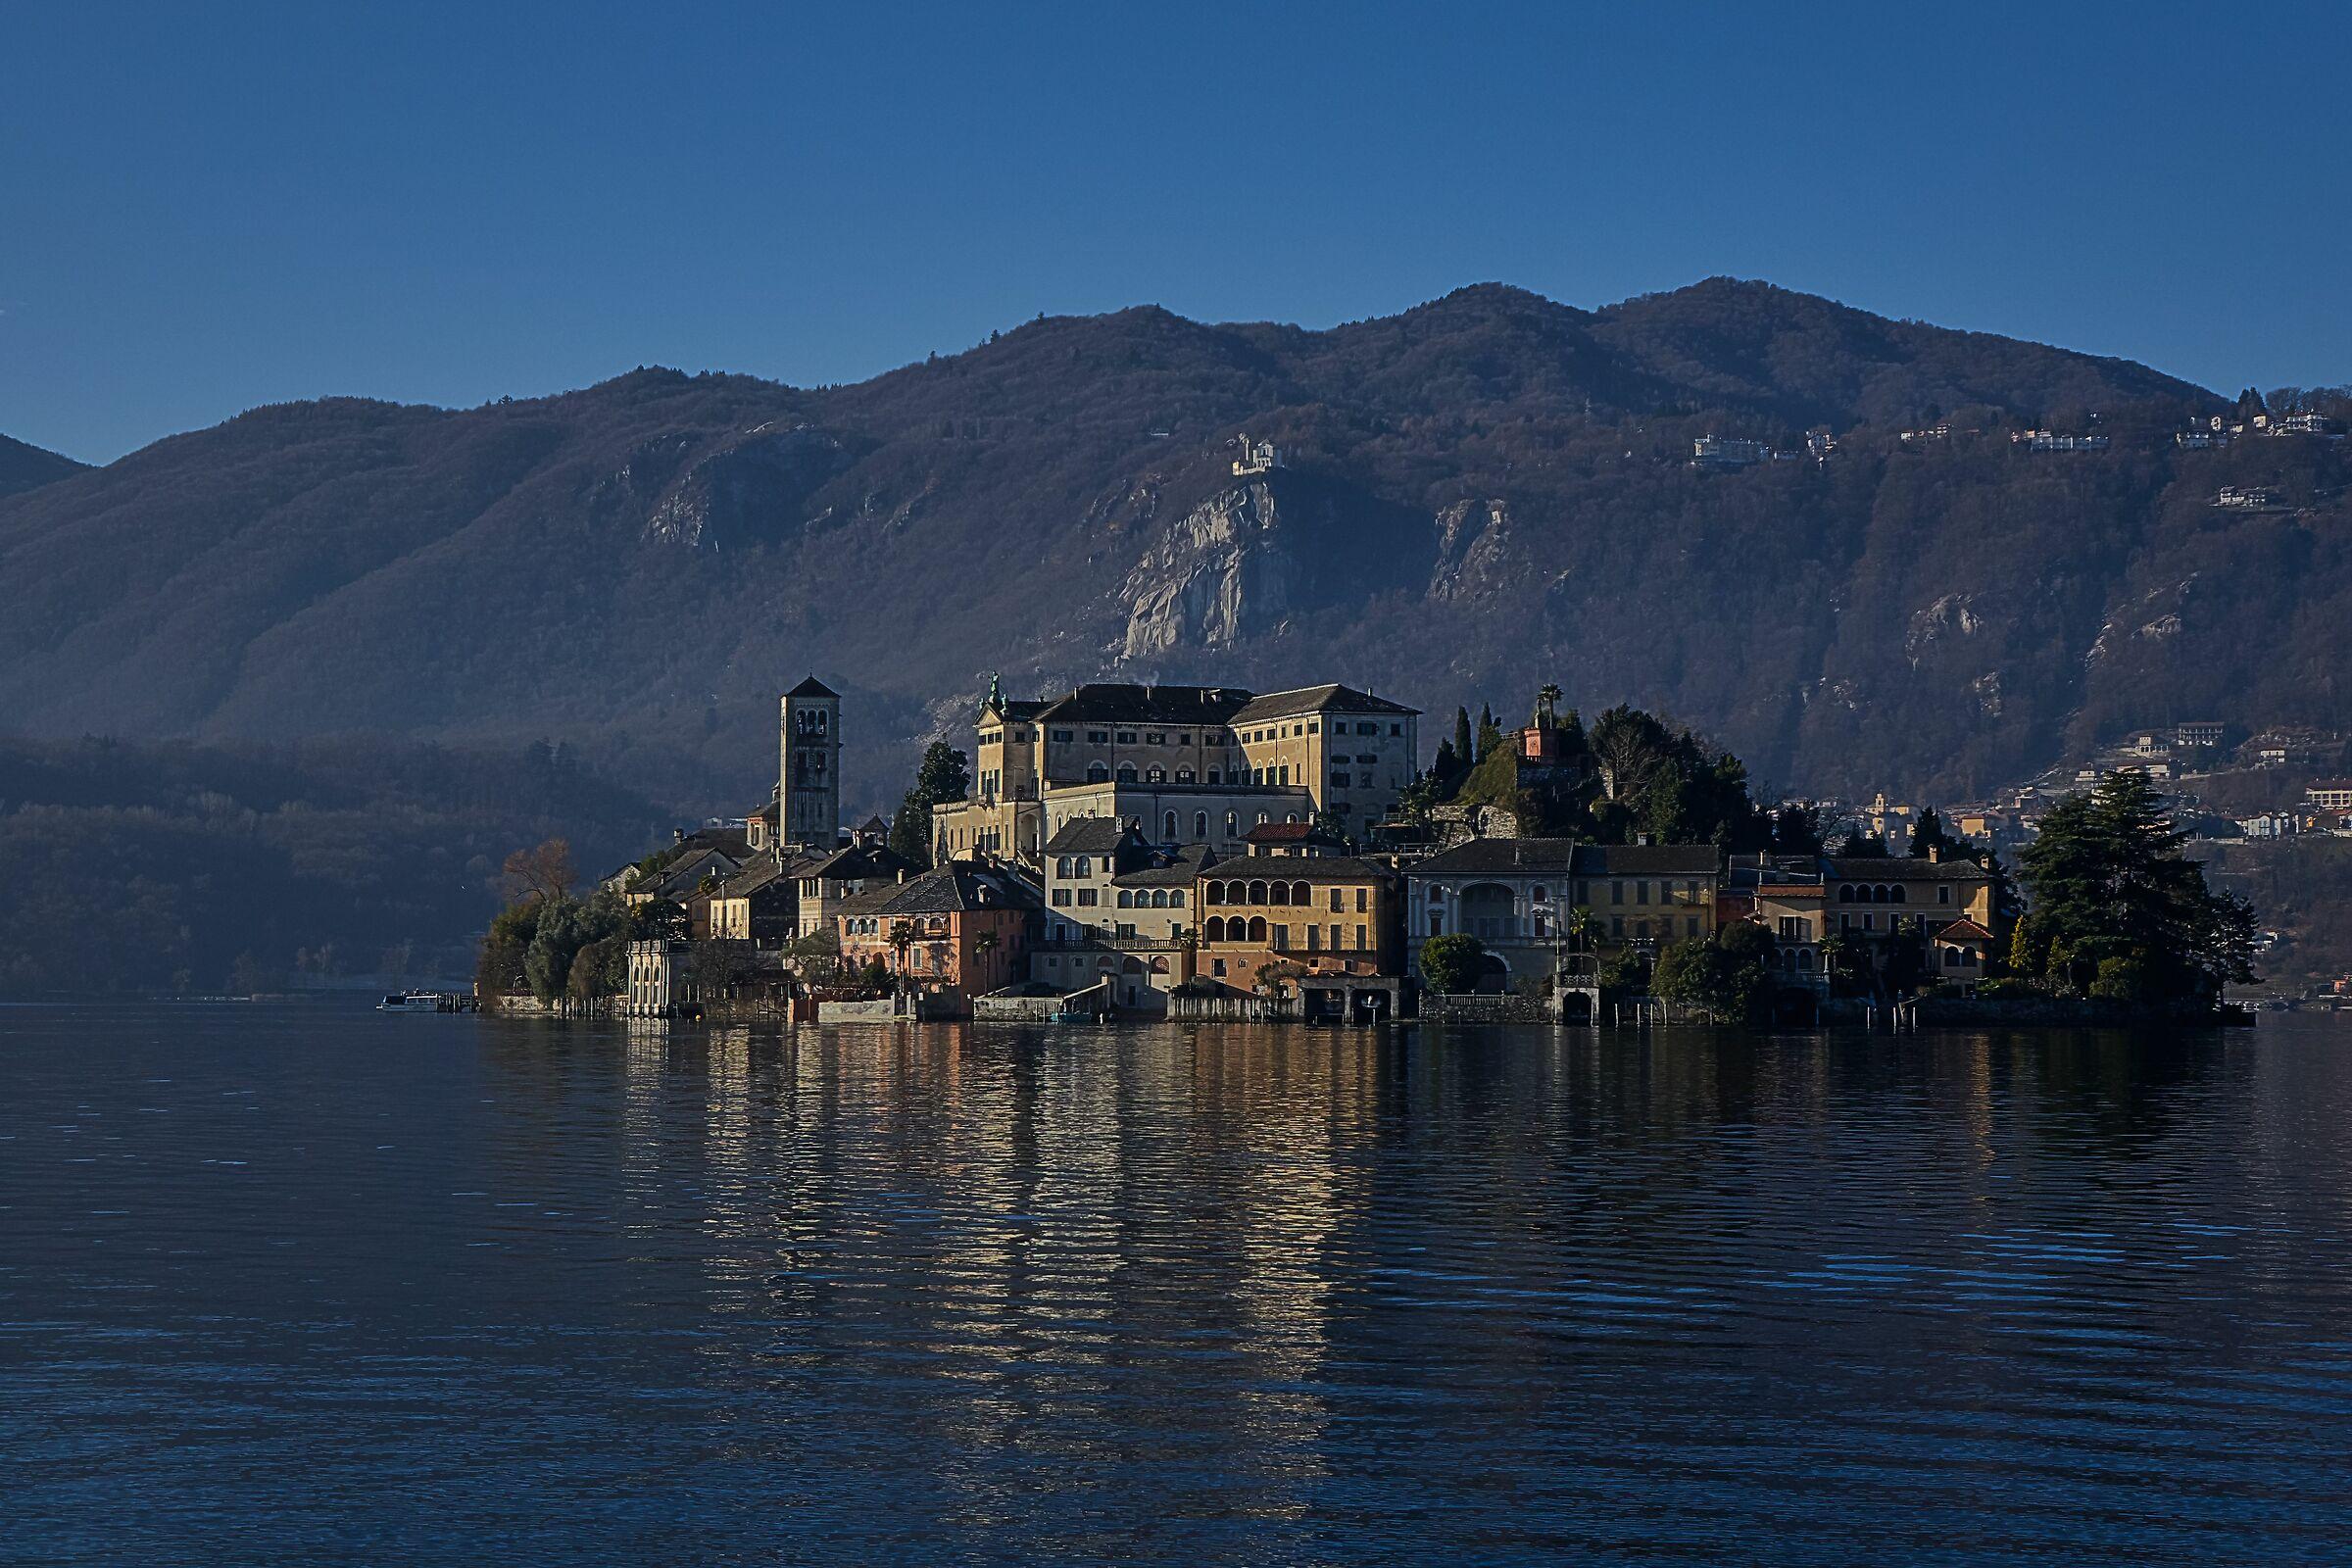 Island of San Giulio dall'imbarcadero di Orta...